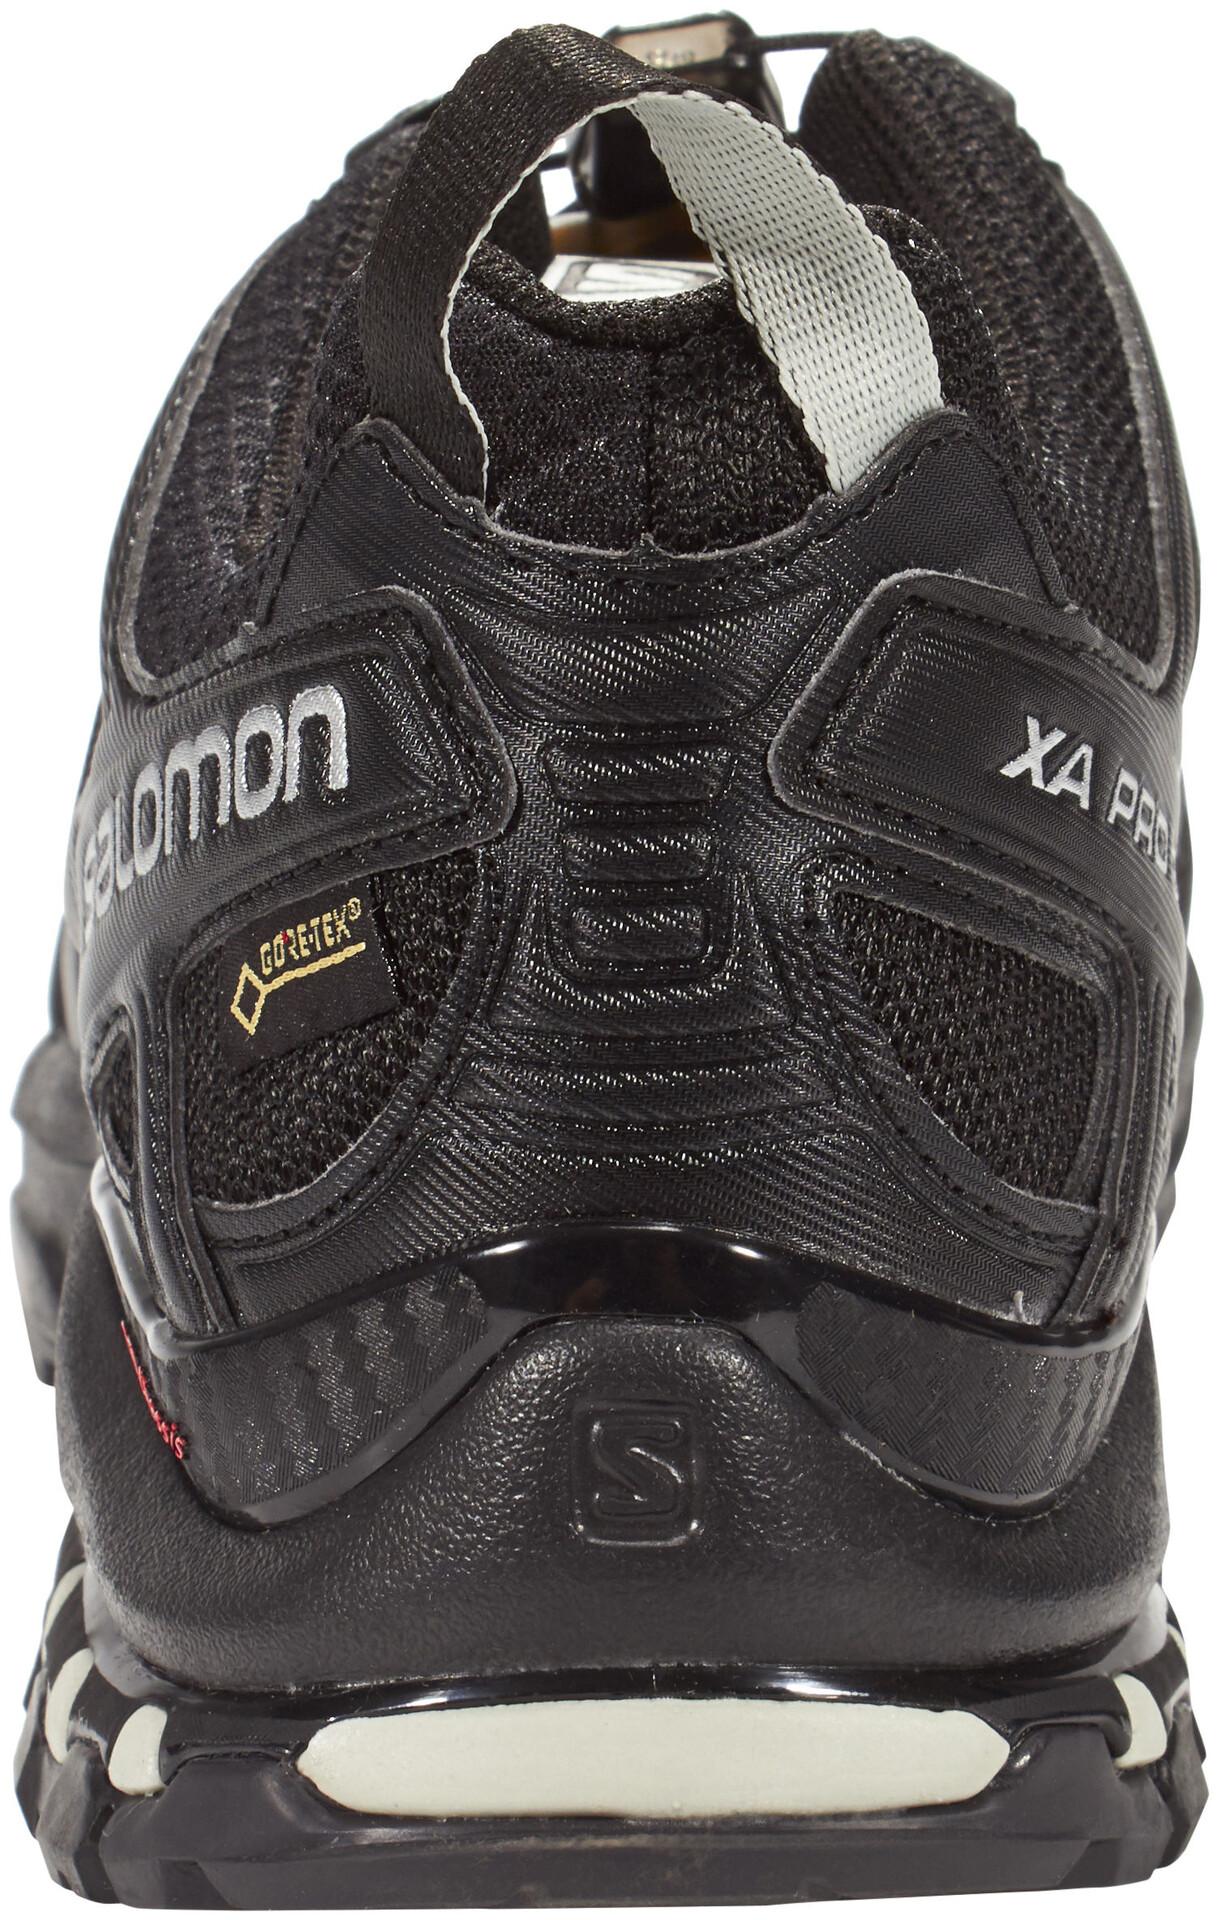 Salomon XA Pro 3D GTX blackblackminerel grey